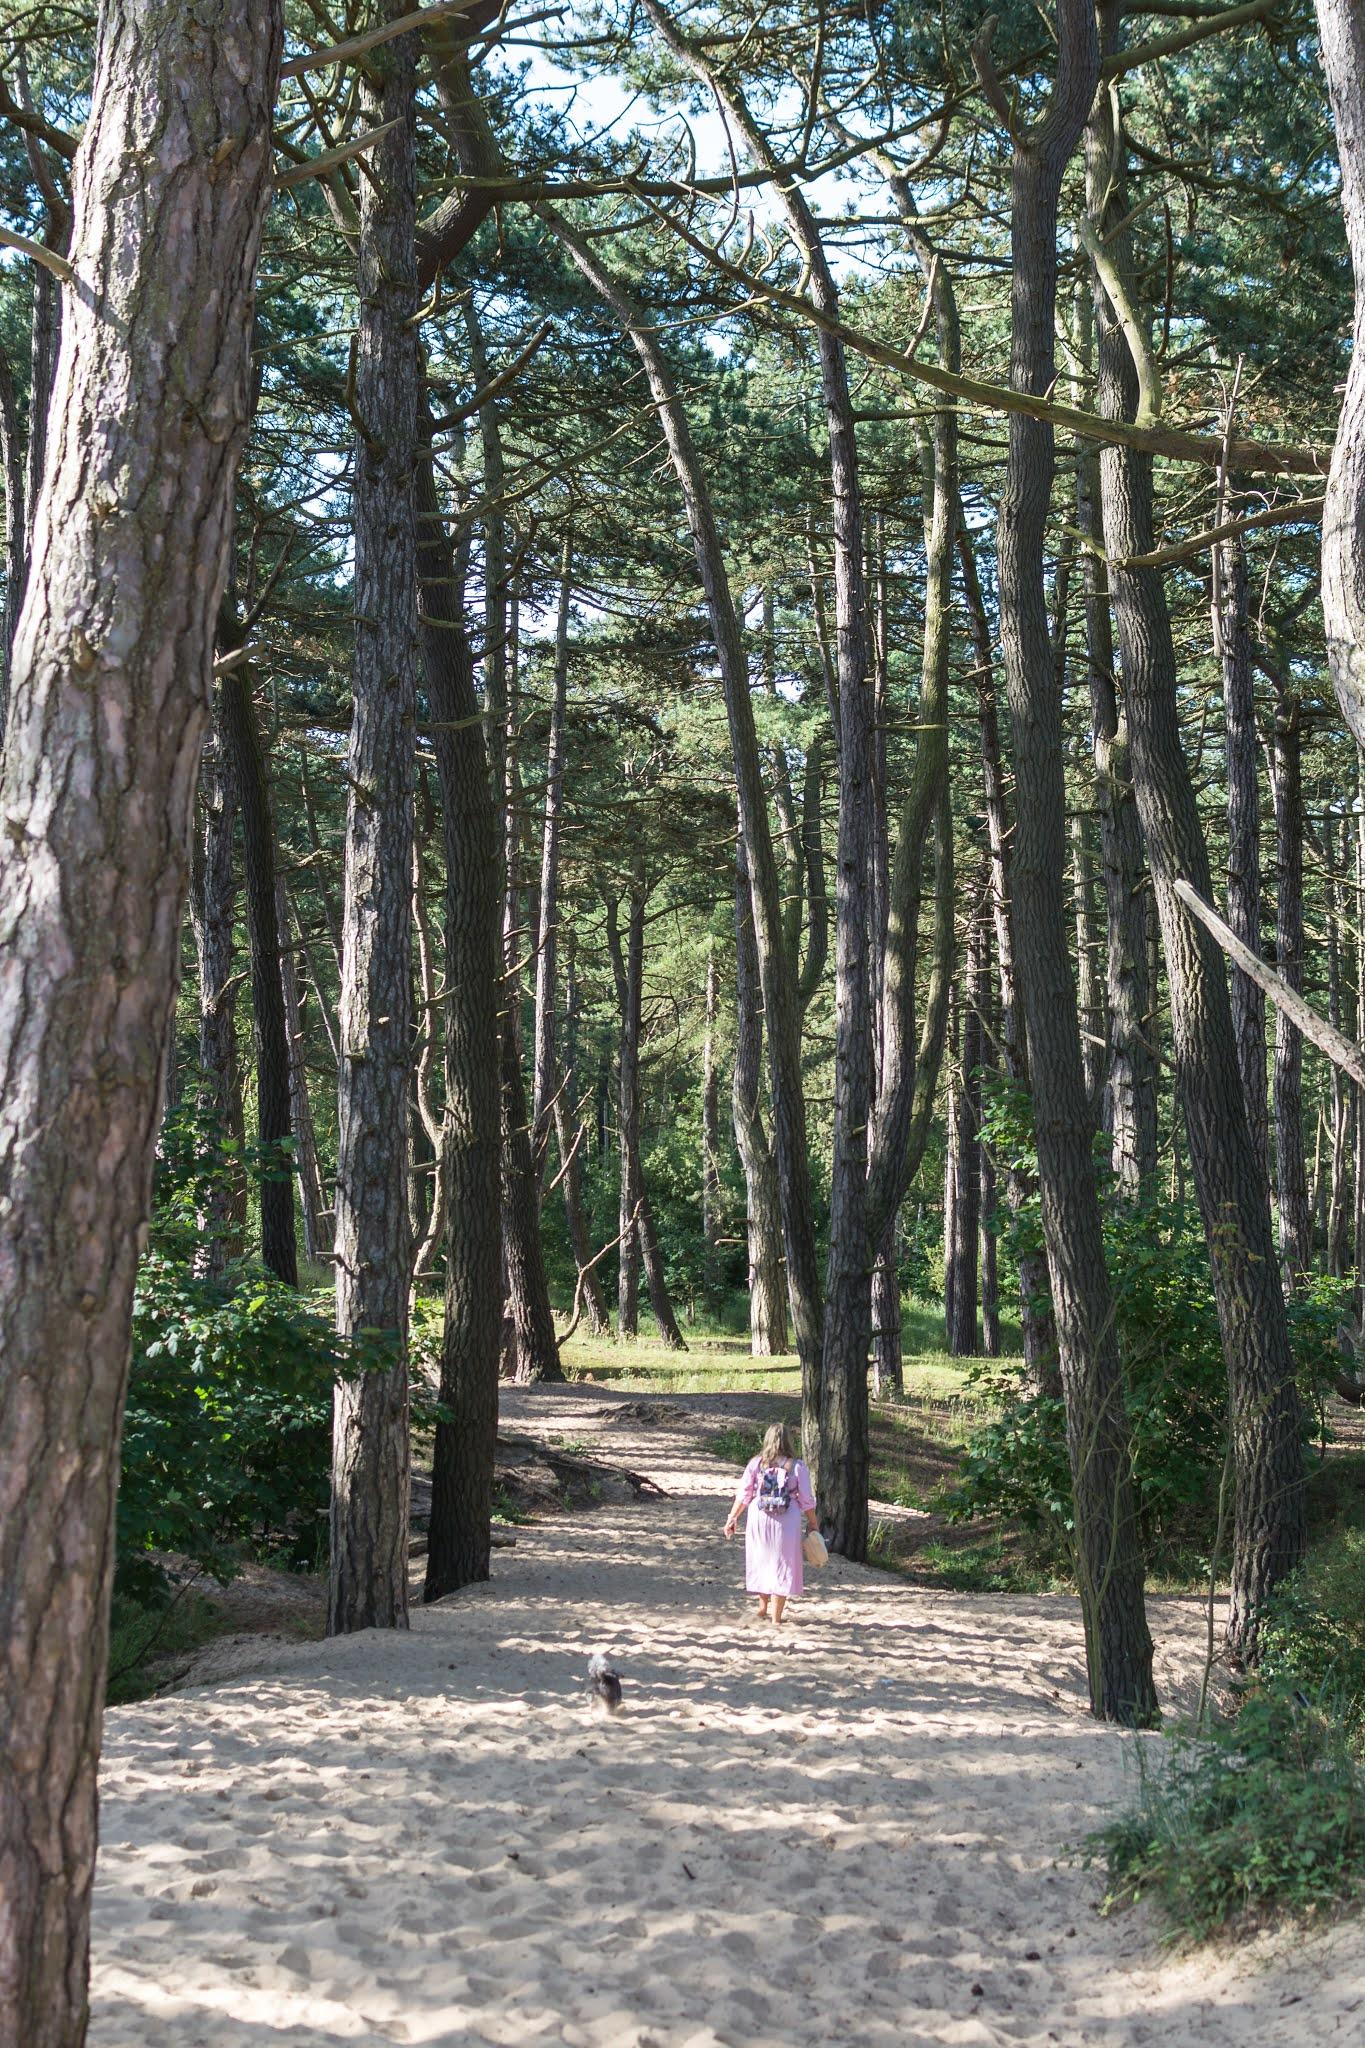 Pine tree woodland on a beach